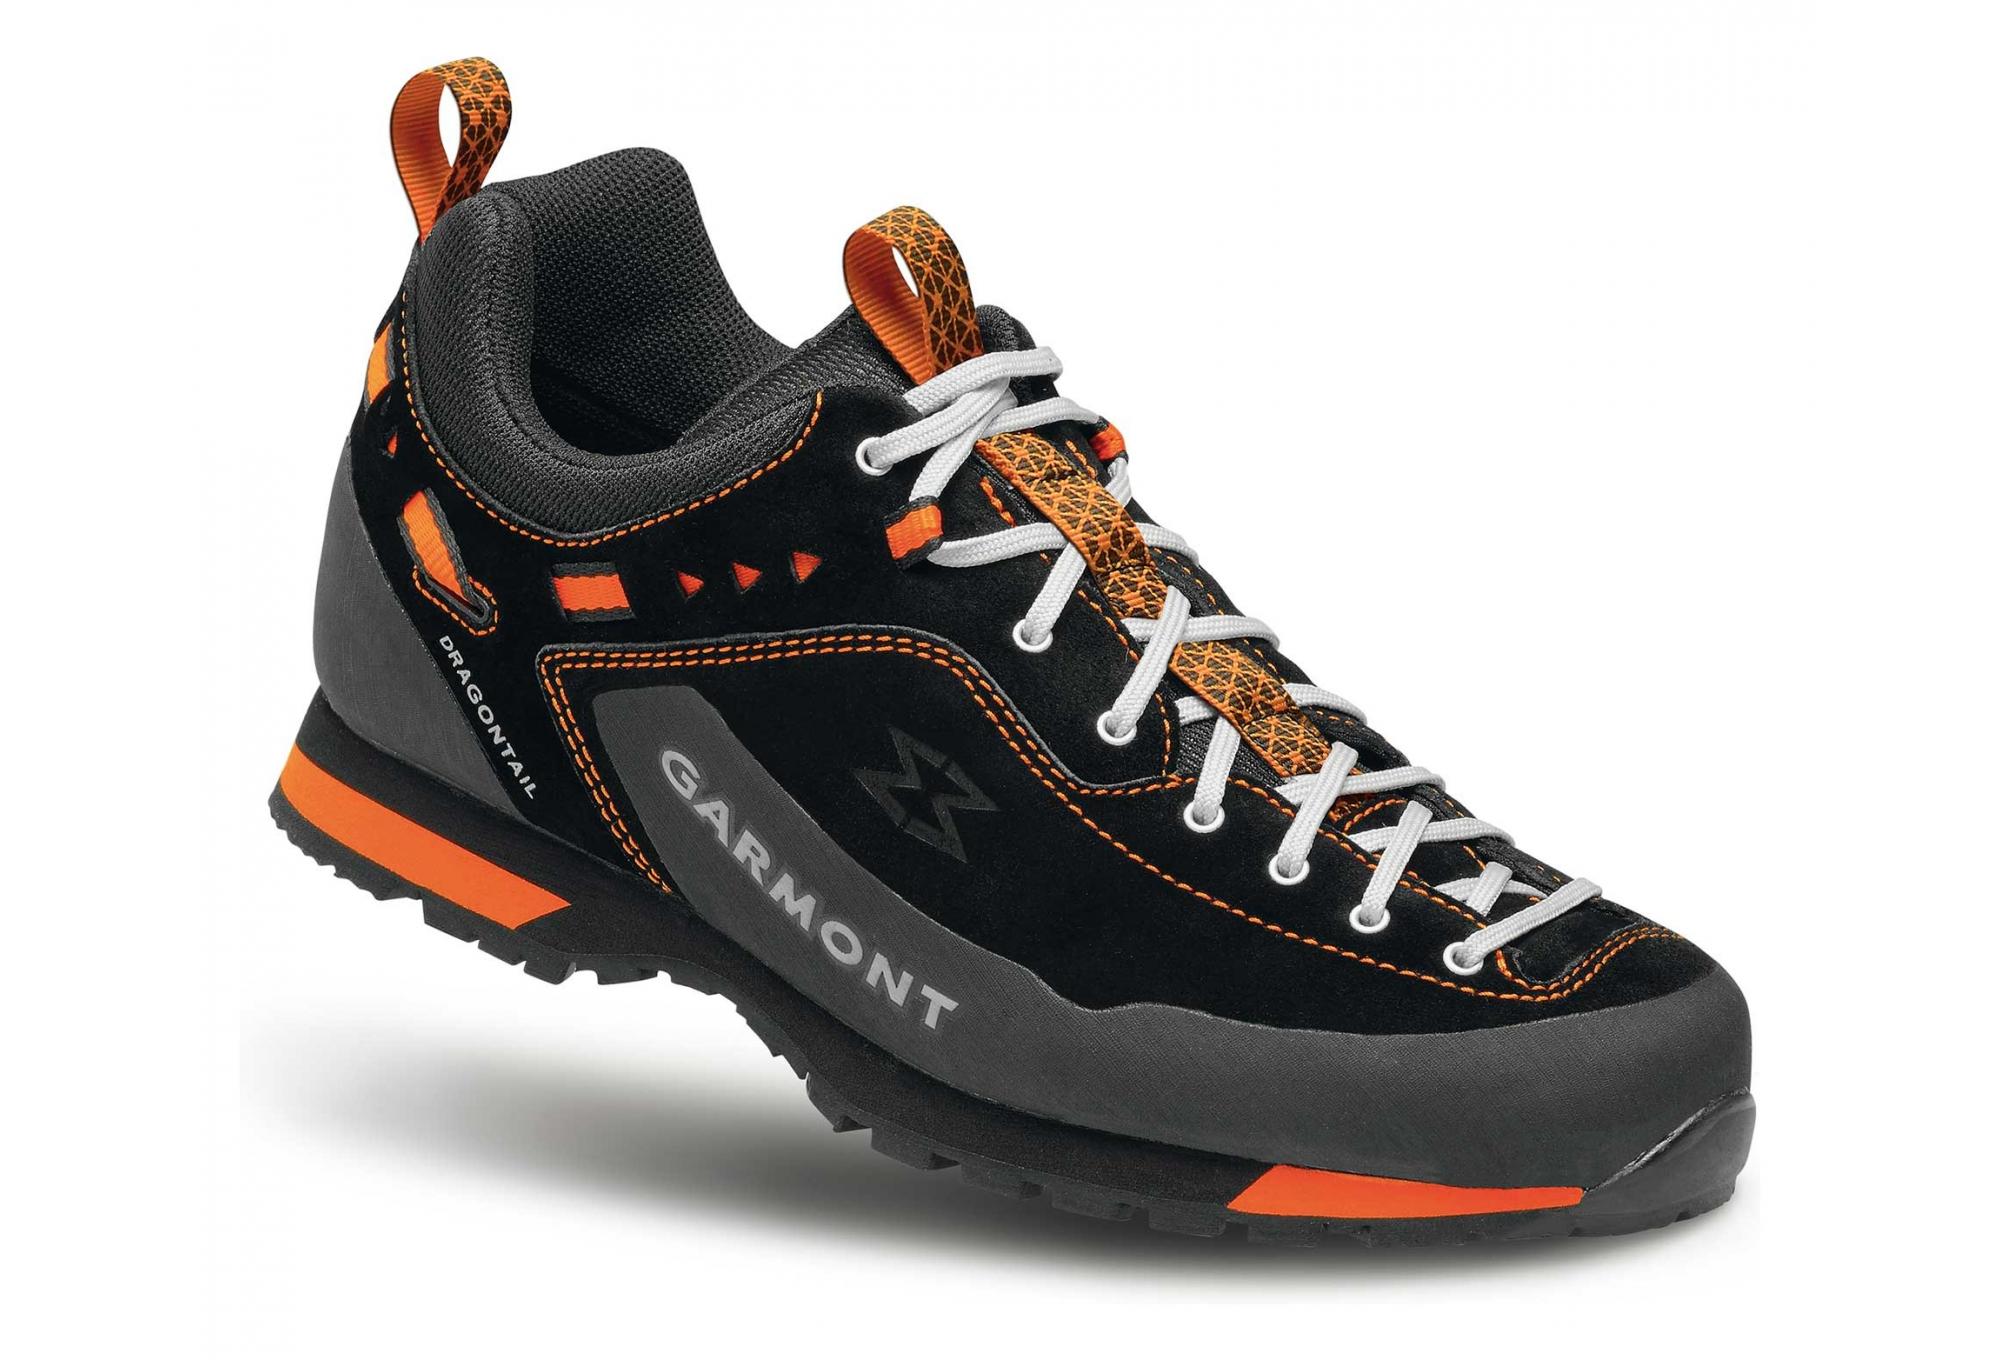 size 40 4823a bffb1 Scarpe Trekking Garmont Dragontail LT Nero Arancioni